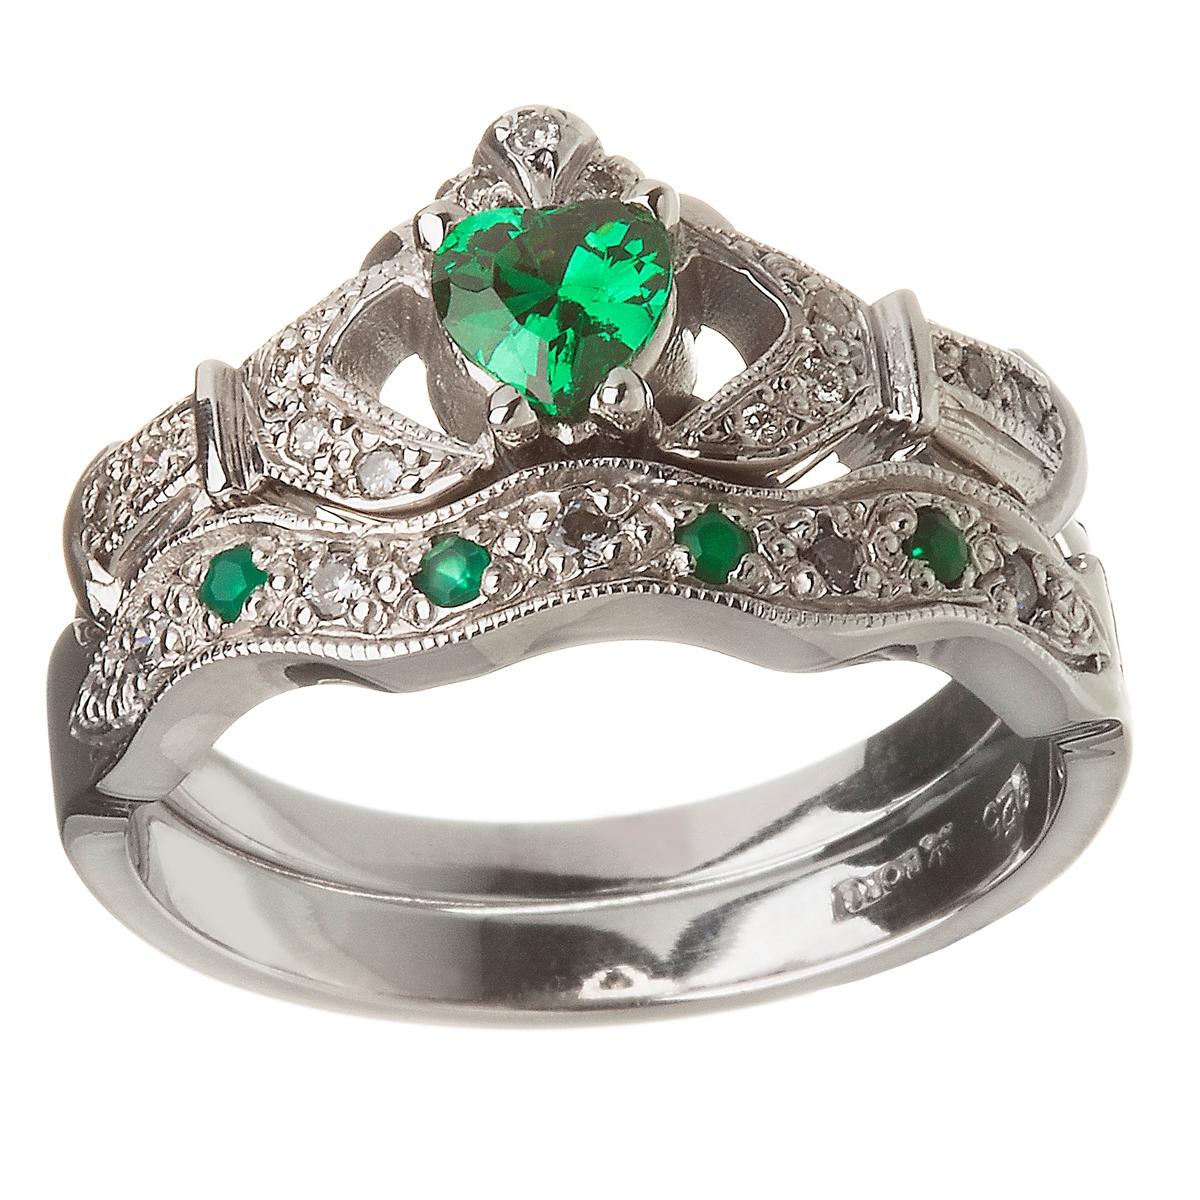 14k White Gold Emerald Set Heart Claddagh Ring & Wedding